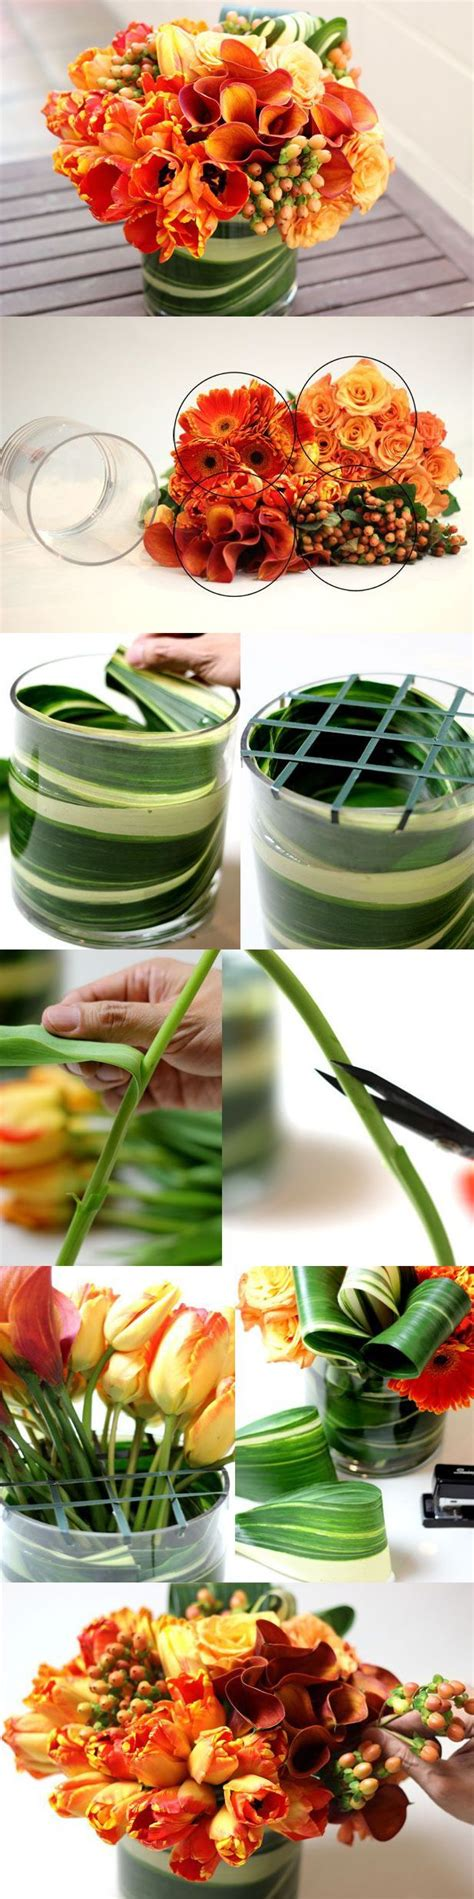 diy flower food best 25 easy flower arrangements ideas on pinterest